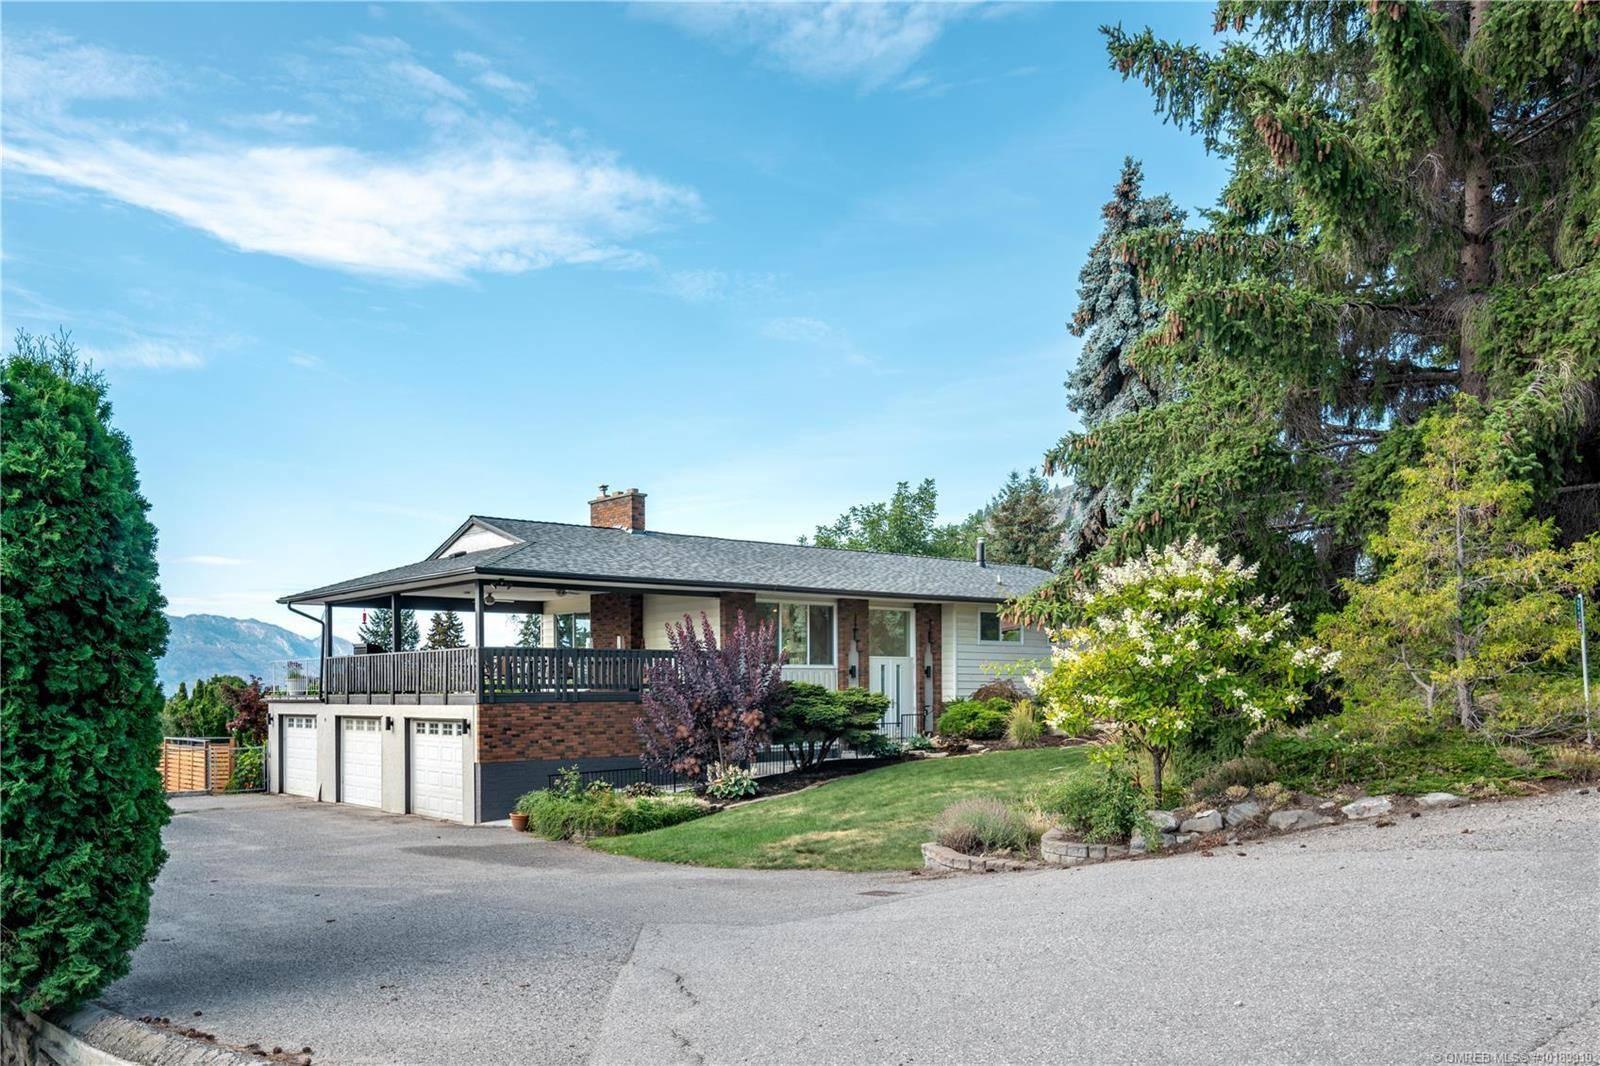 House for sale at 935 Rumney Rd West Kelowna British Columbia - MLS: 10189910